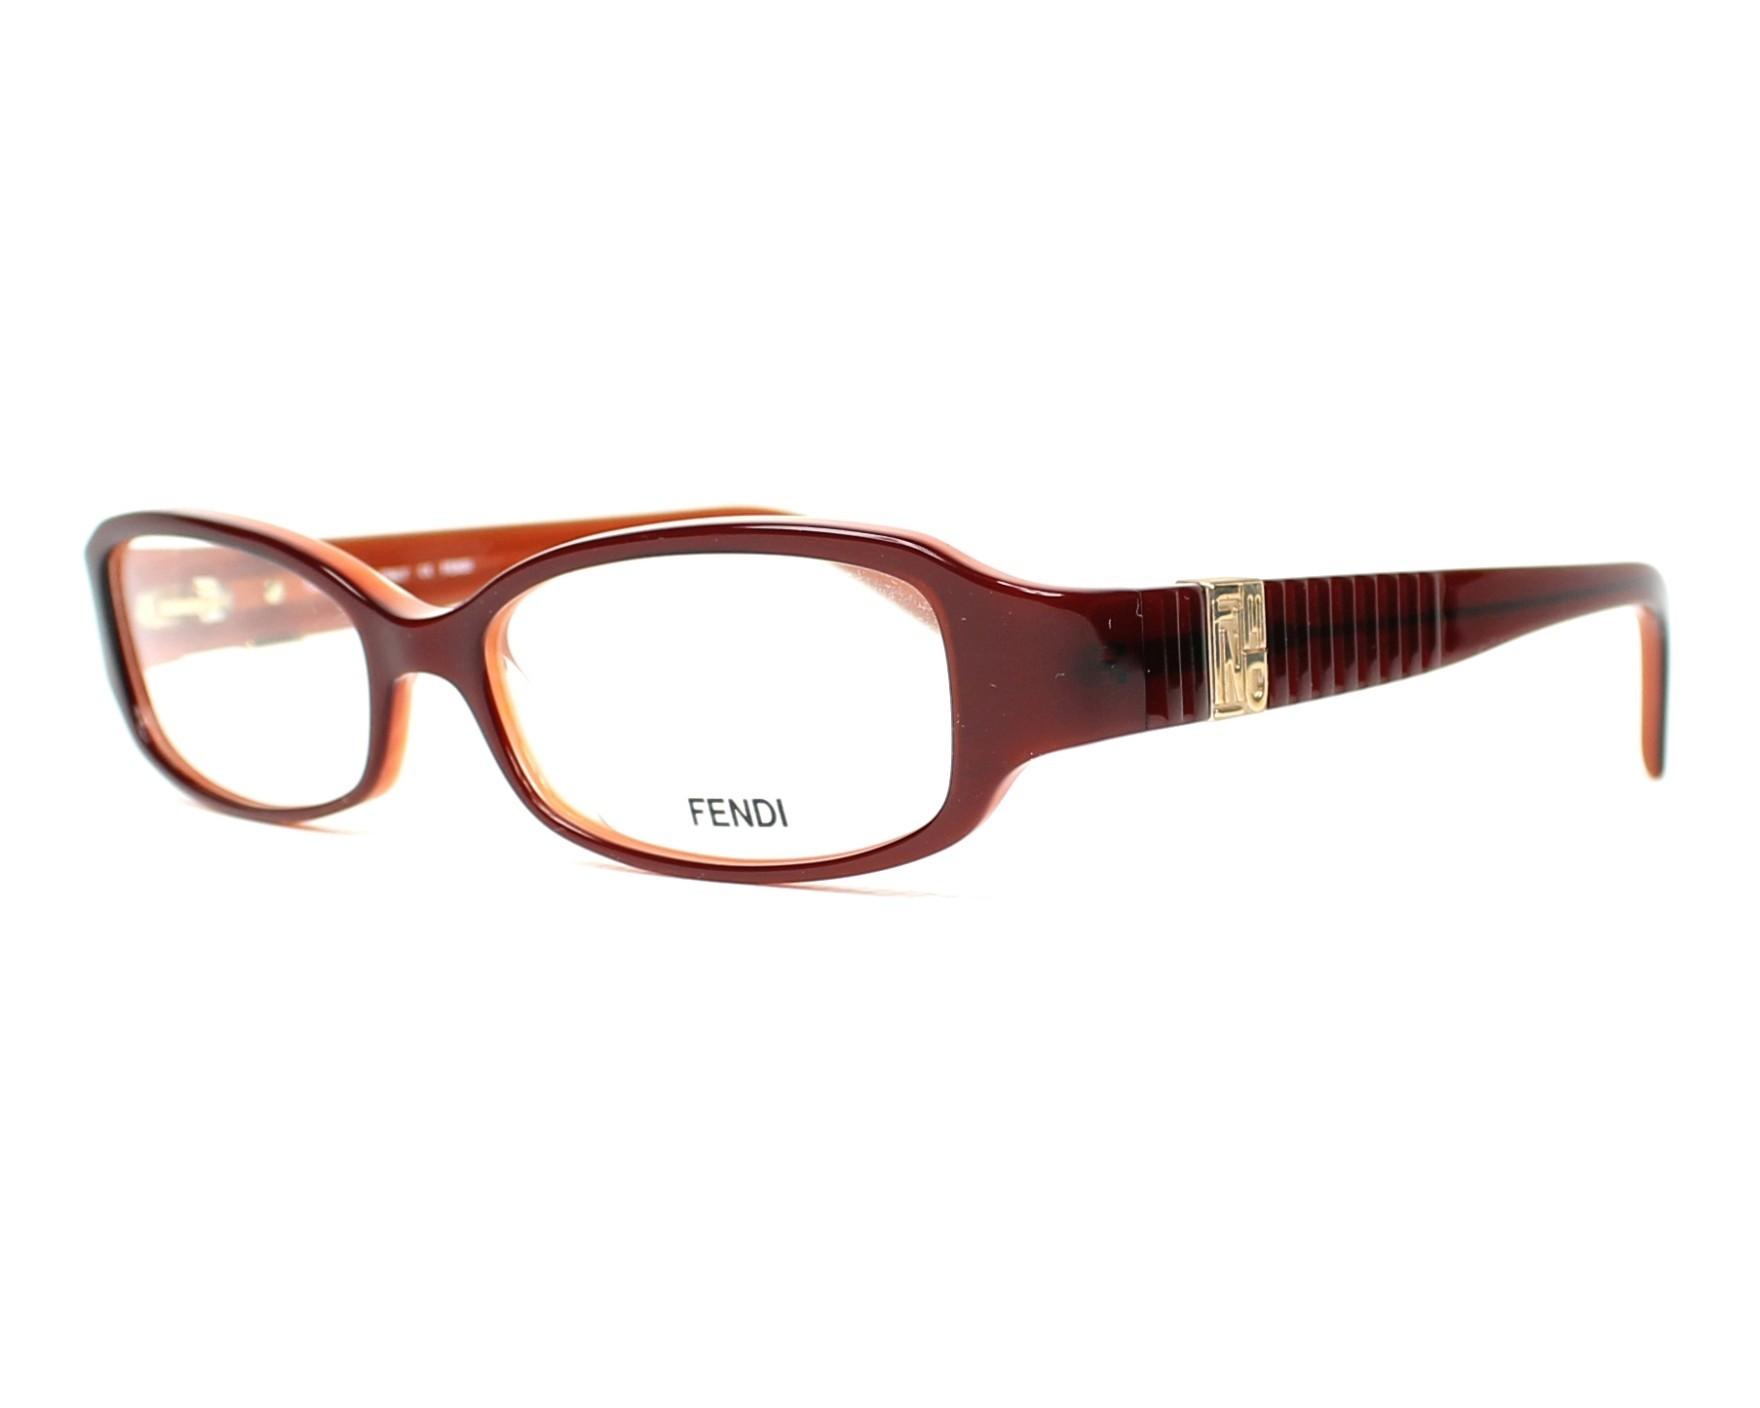 order your fendi eyeglasses f 744 613 52 today